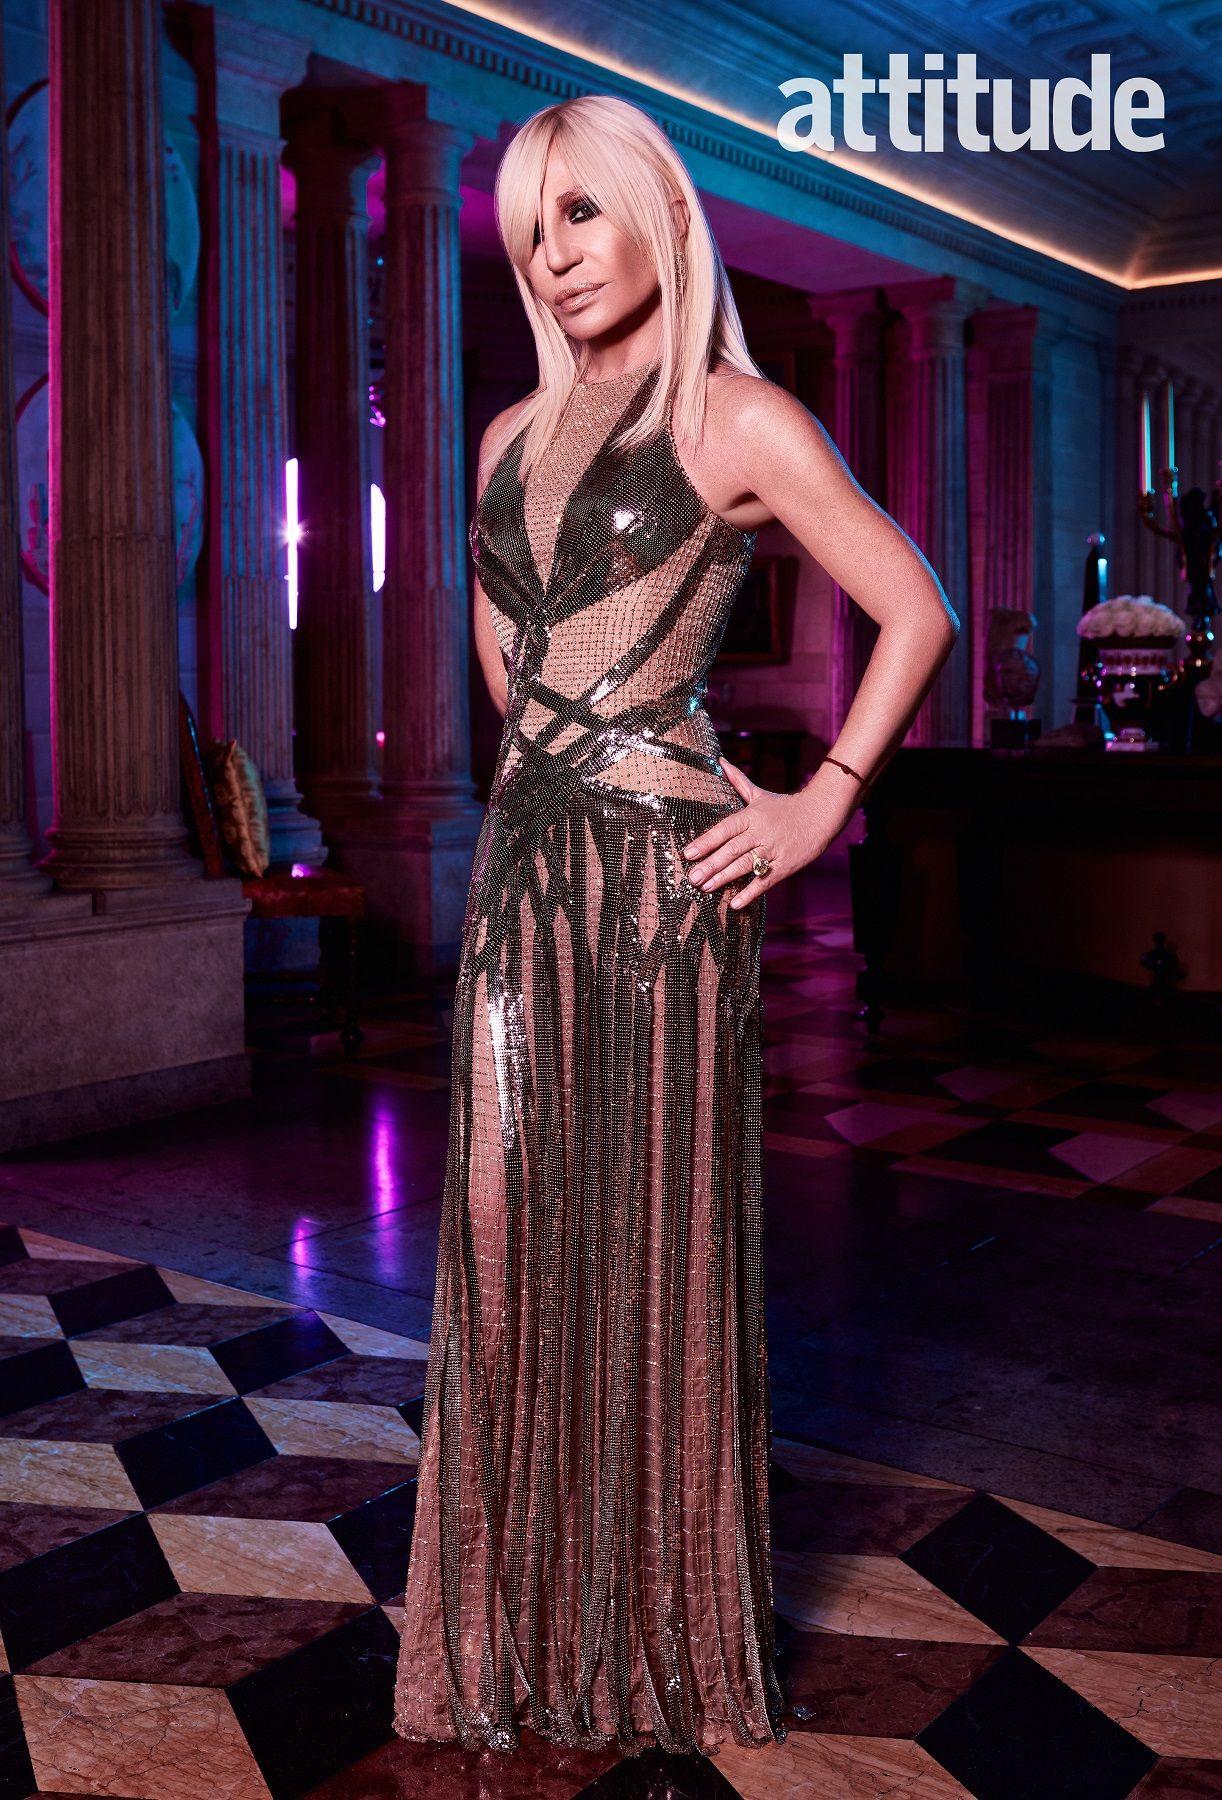 Donatella Versace Editorial Featured In Attitude Magazine January